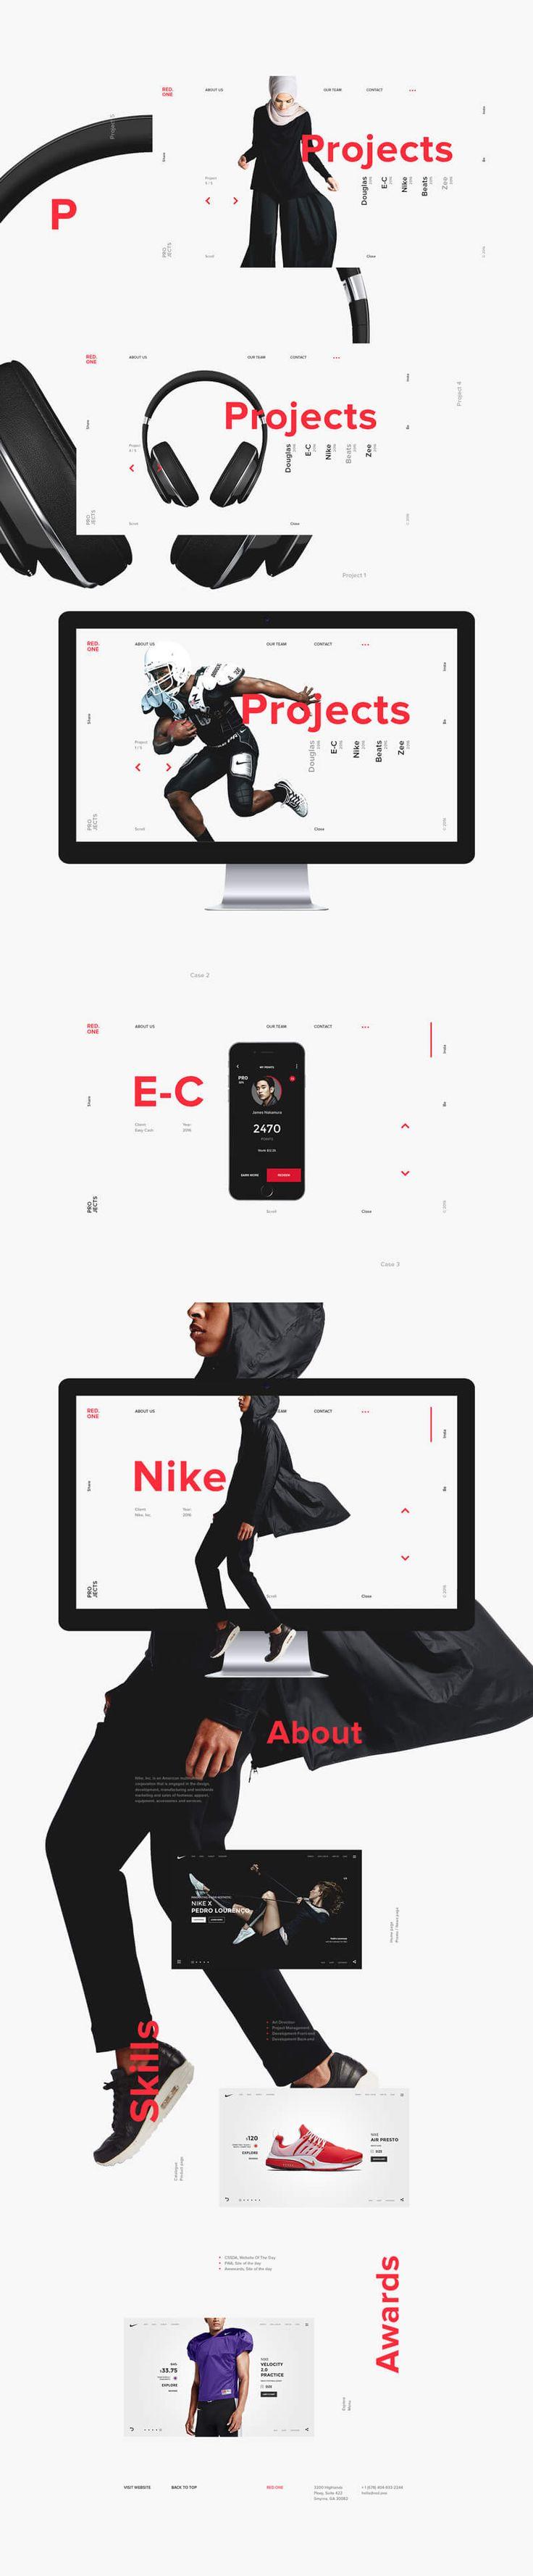 Red-One2 #ui #ux #userexperience #website #webdesign #design